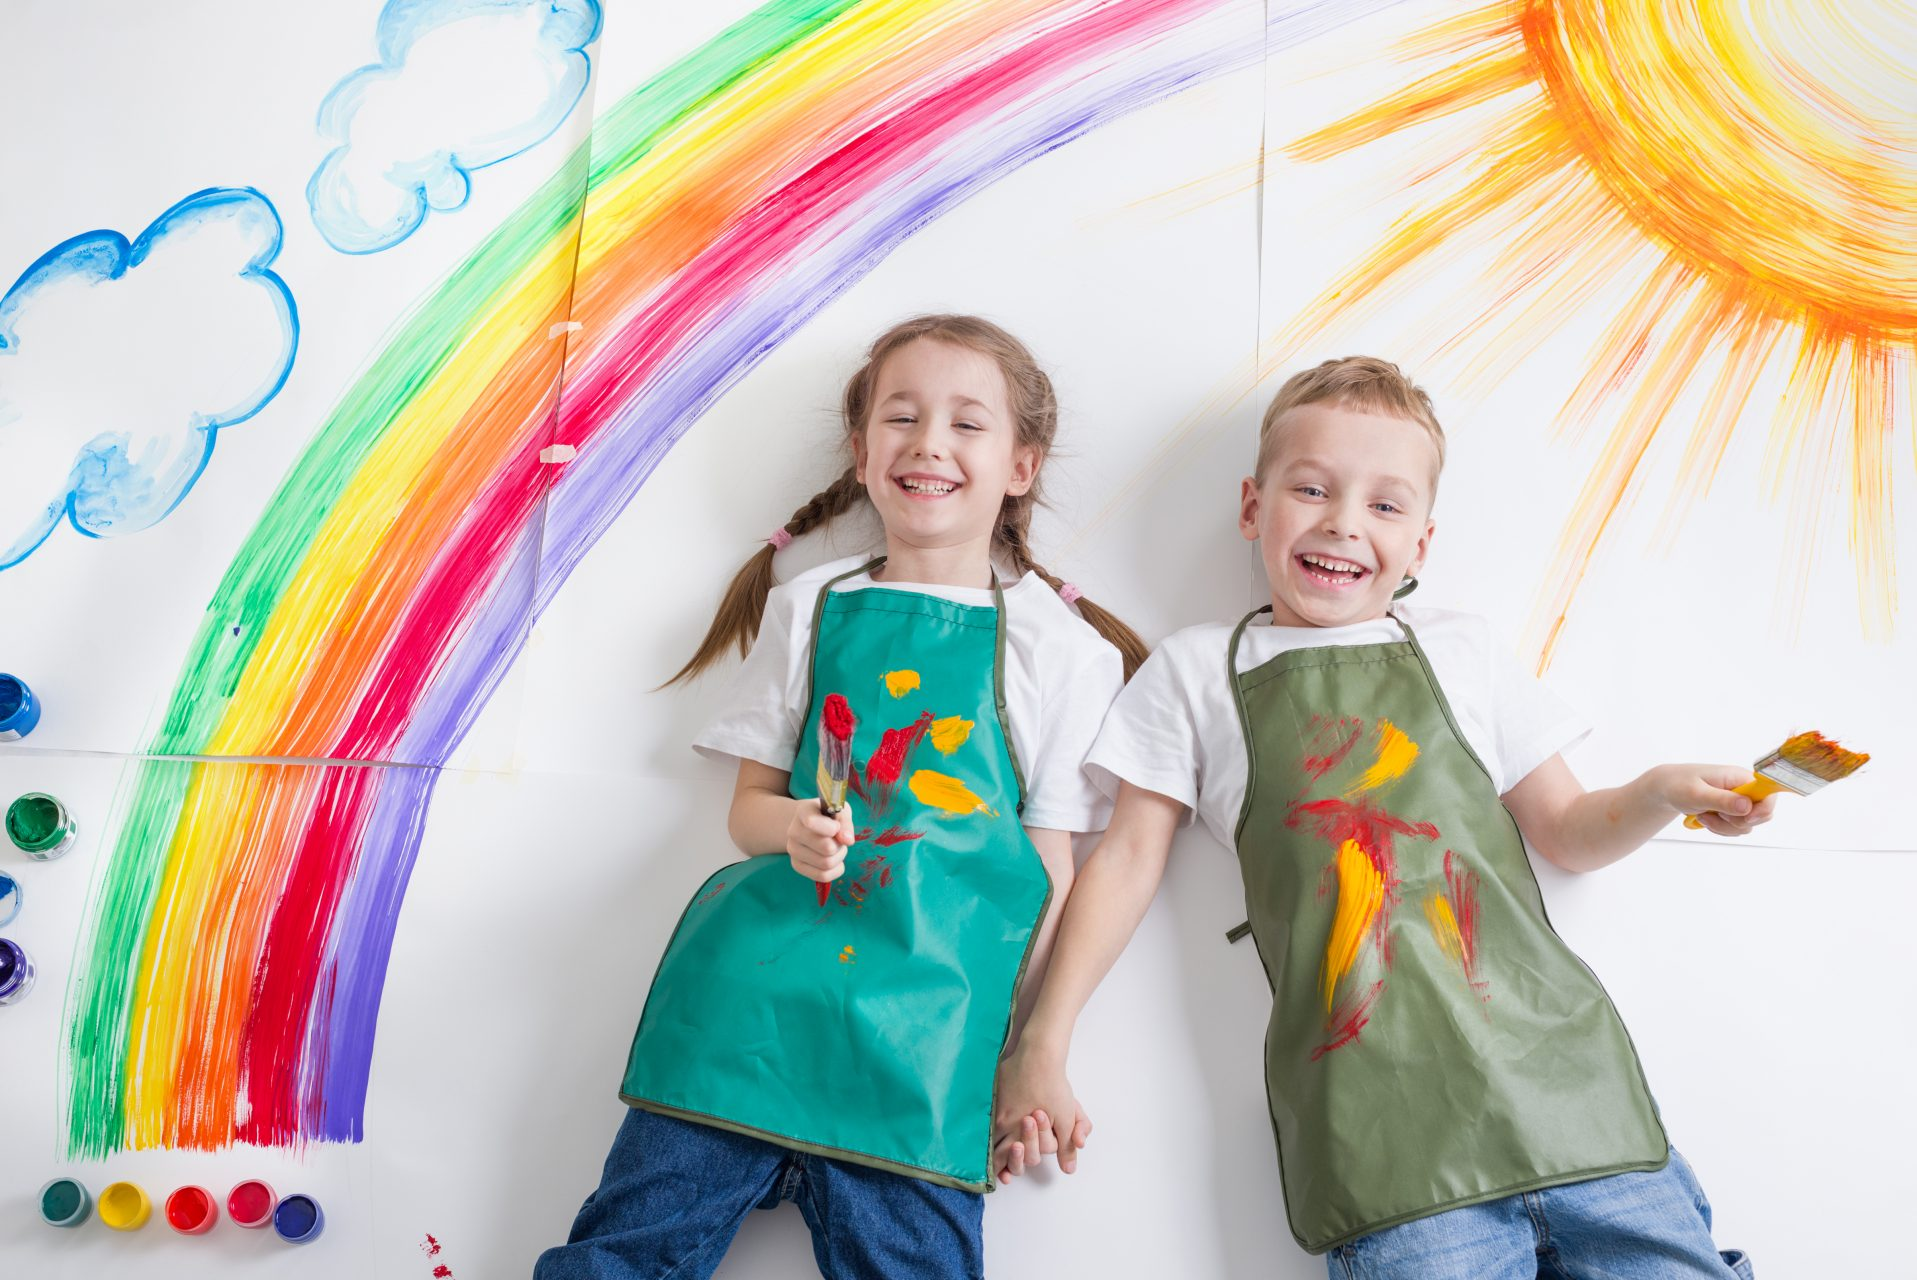 Kids,Painting,Rainbow